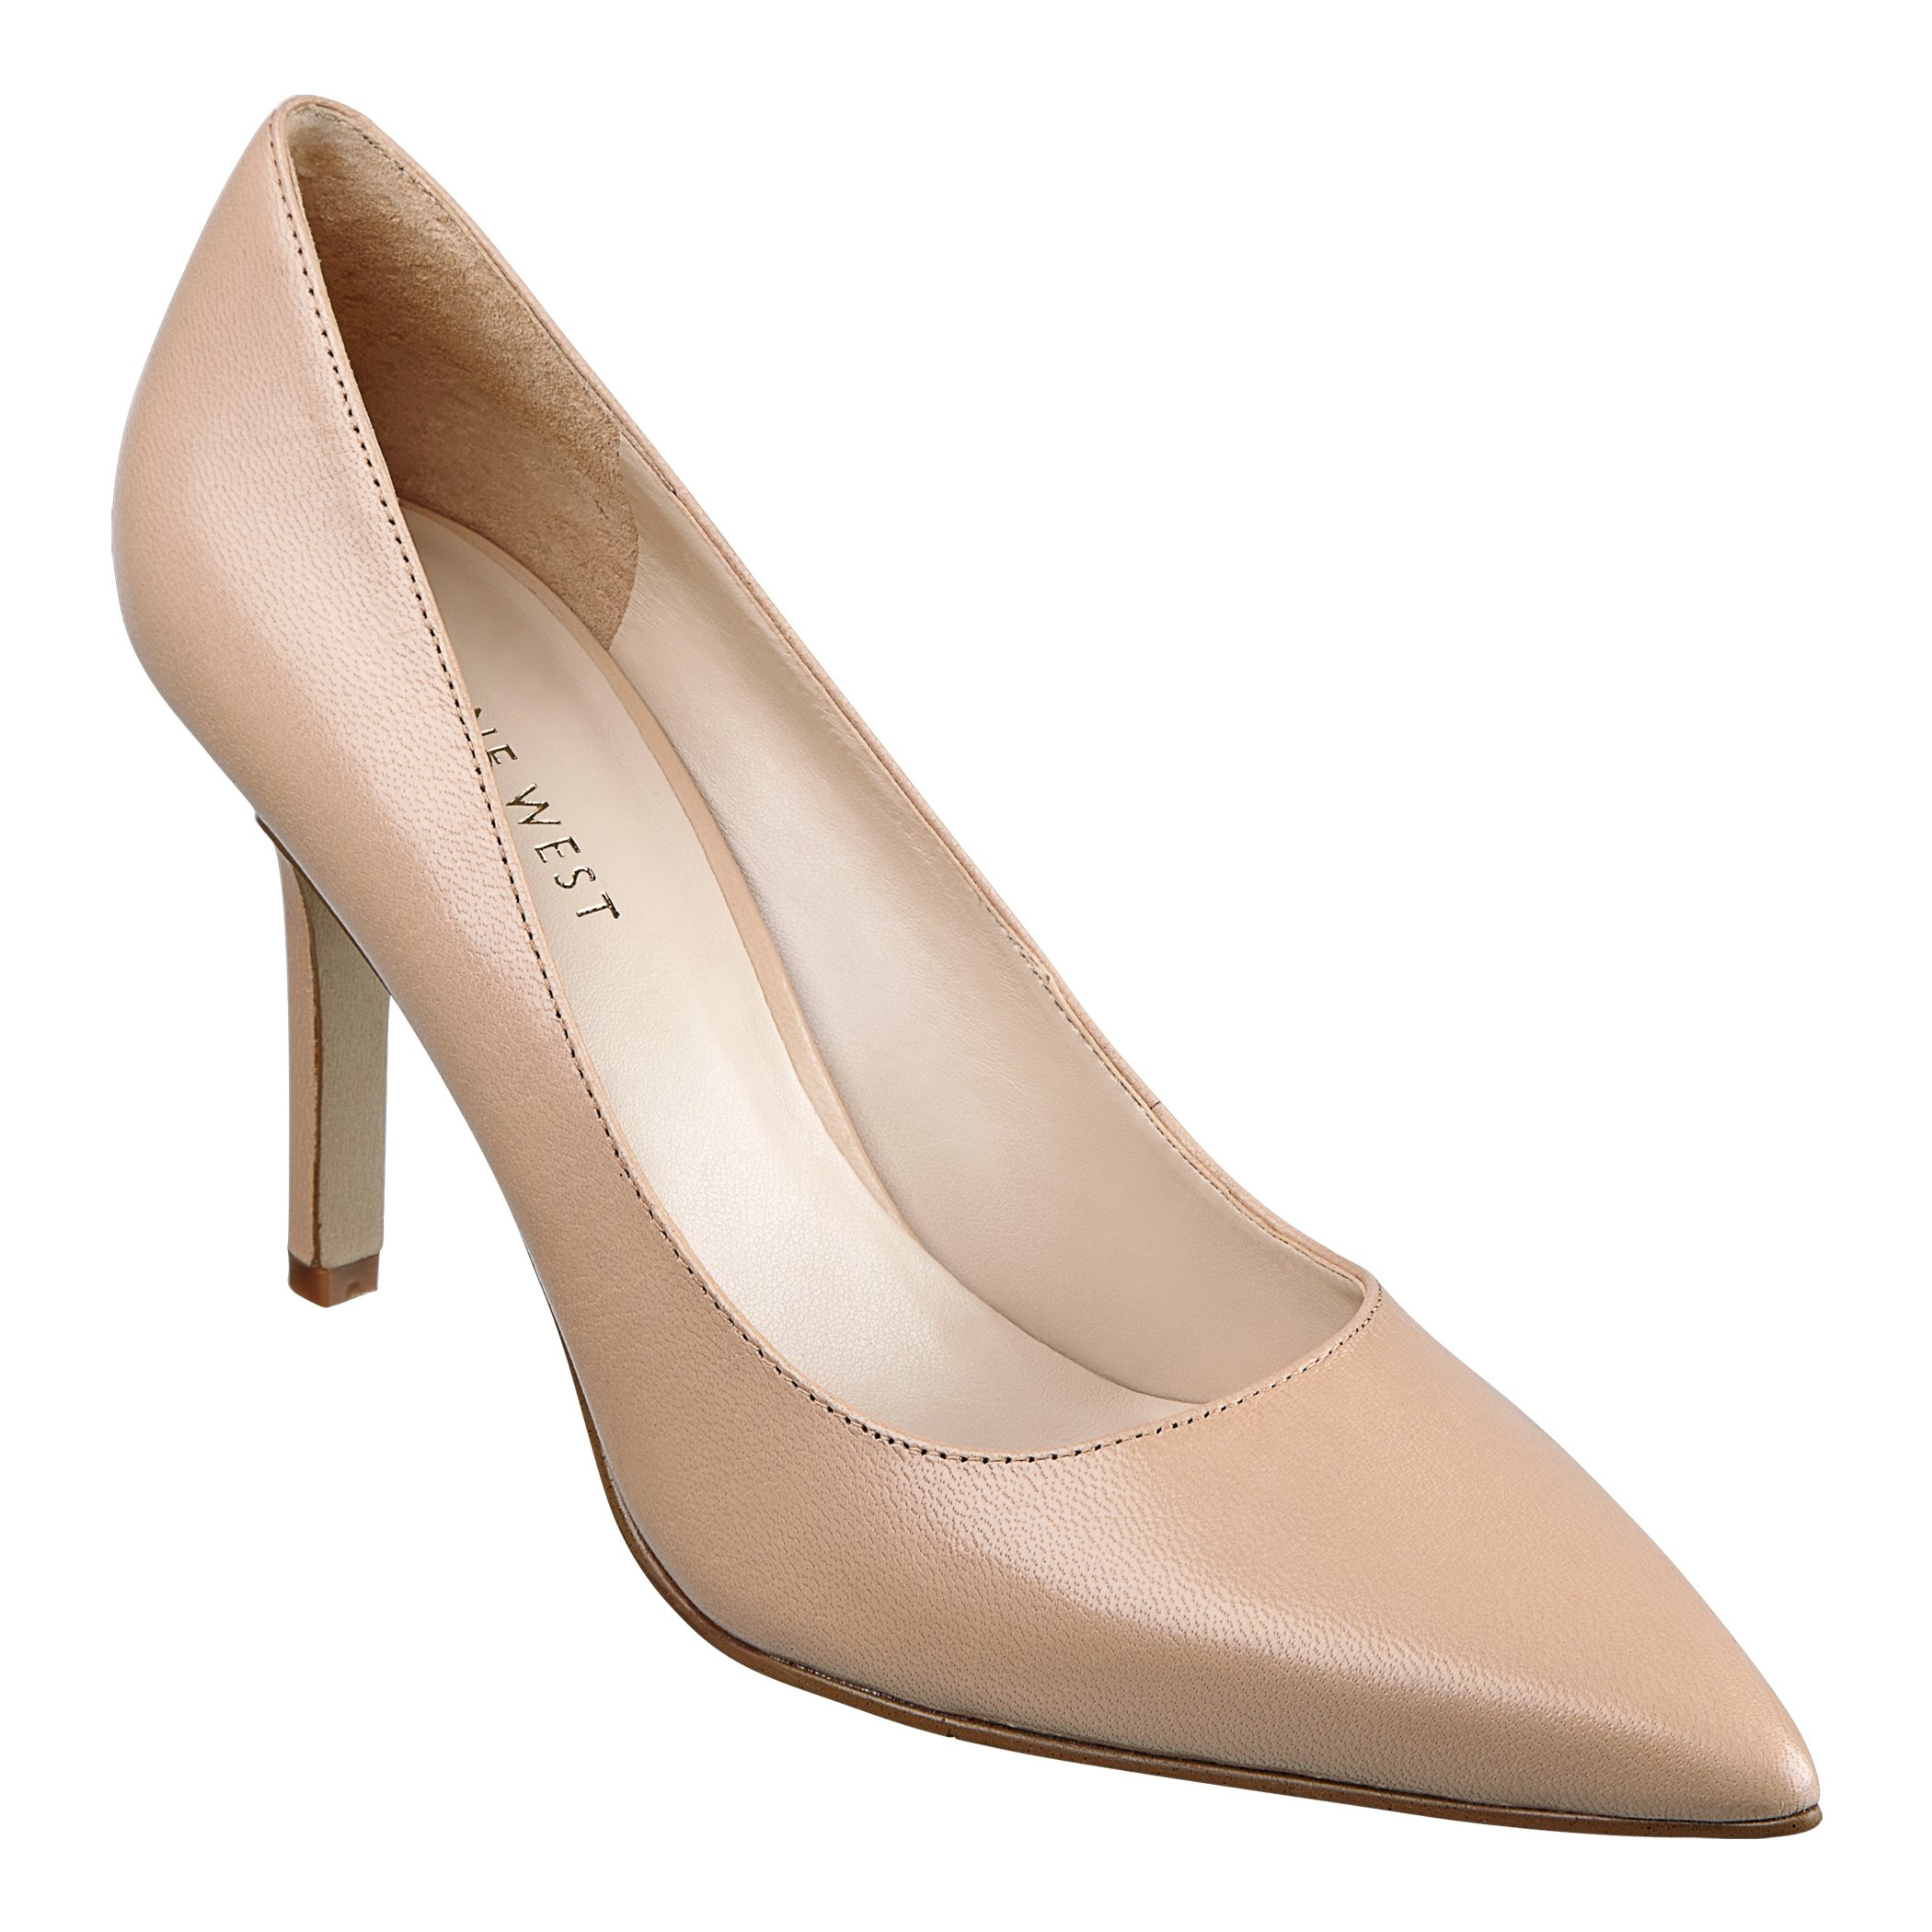 Ninewest Com Shoes